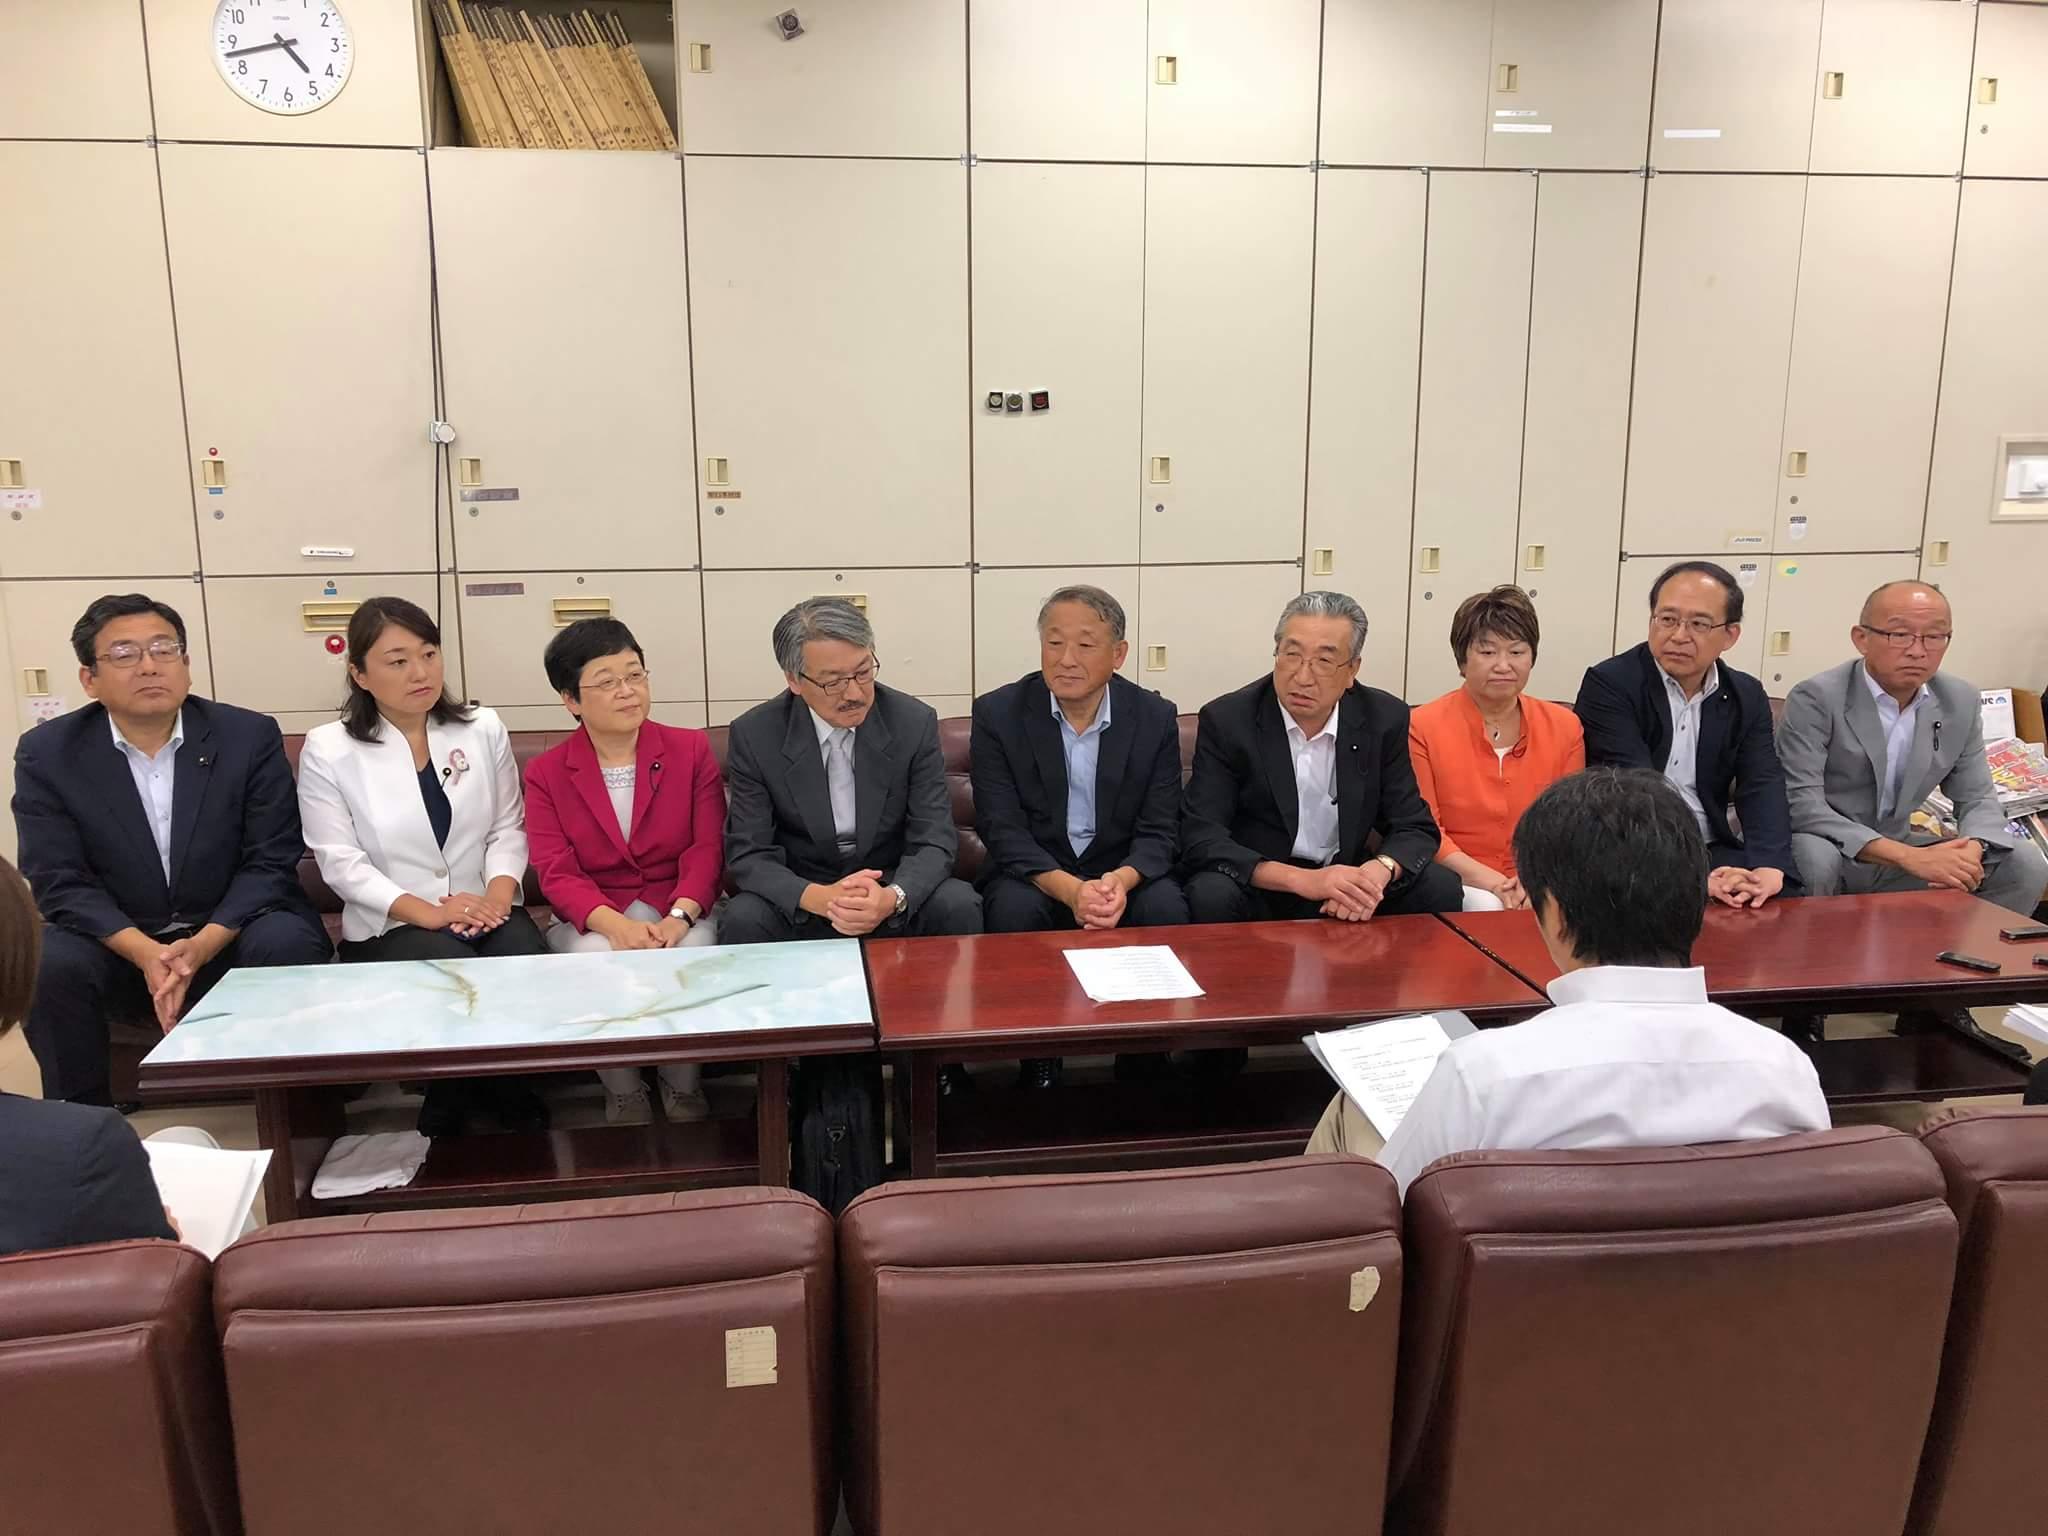 来年の県議選挙立候補の記者会見